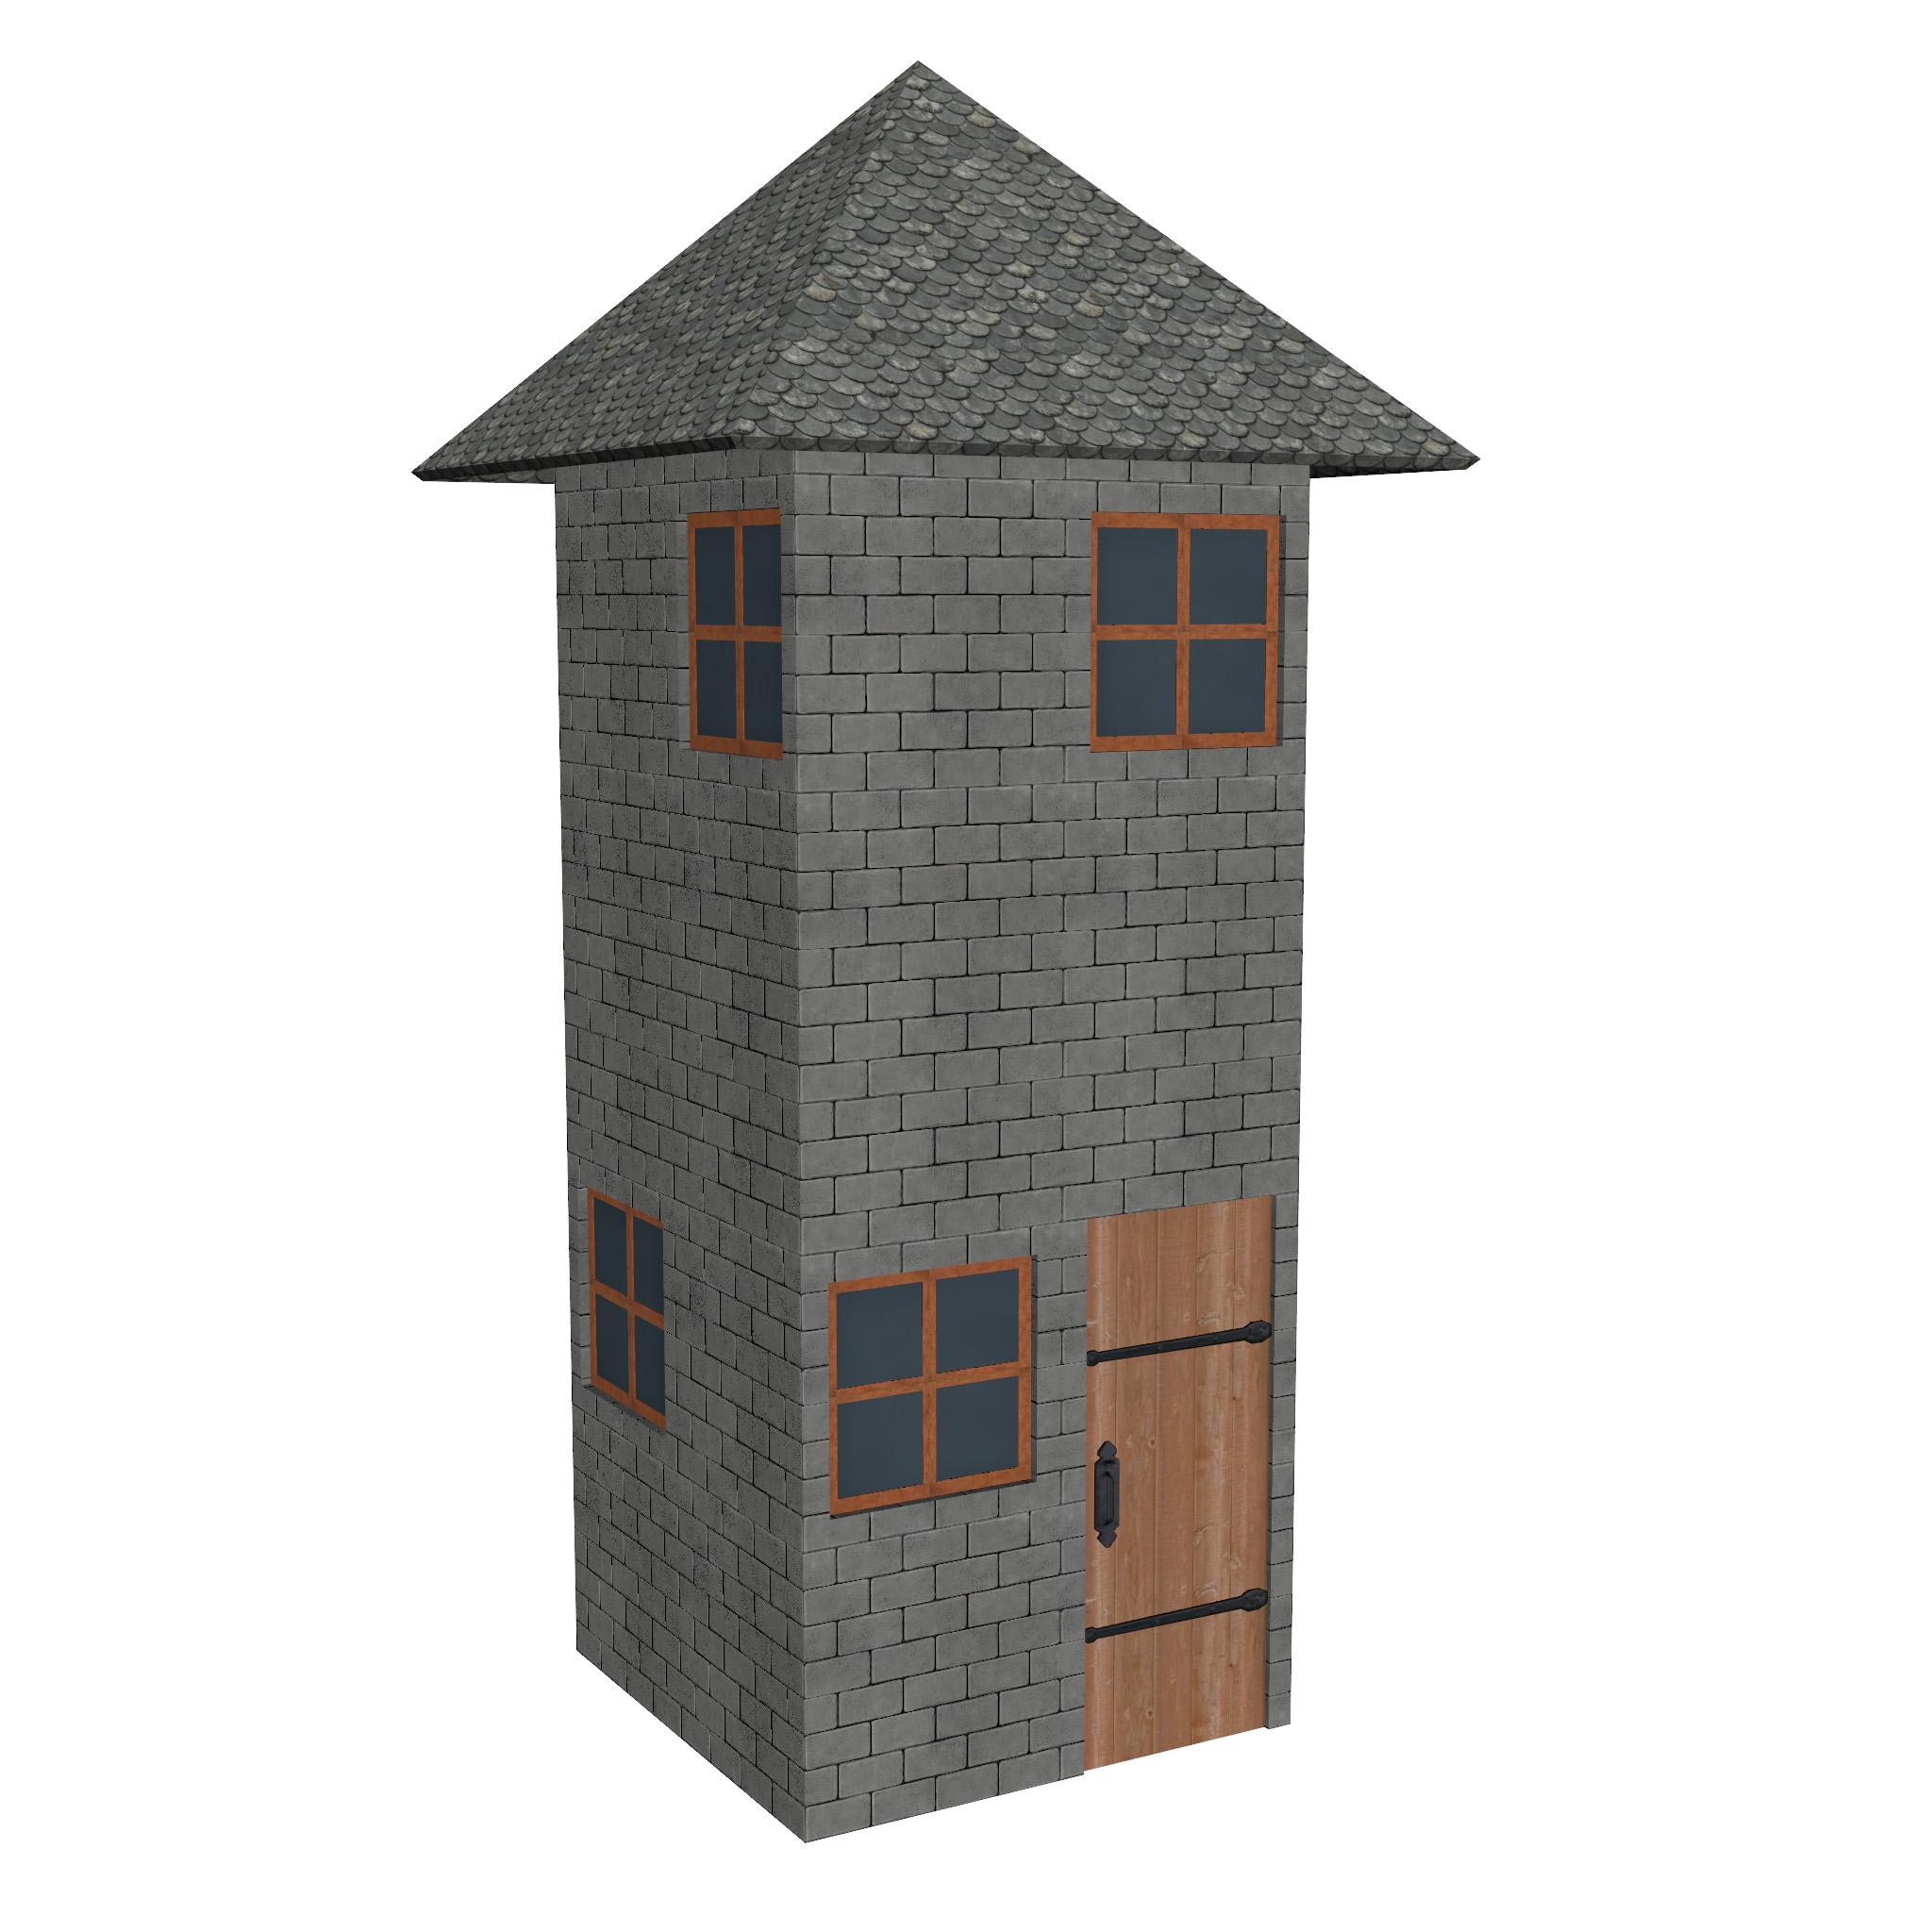 modular brick house set 3d model fbx ma mb 271400